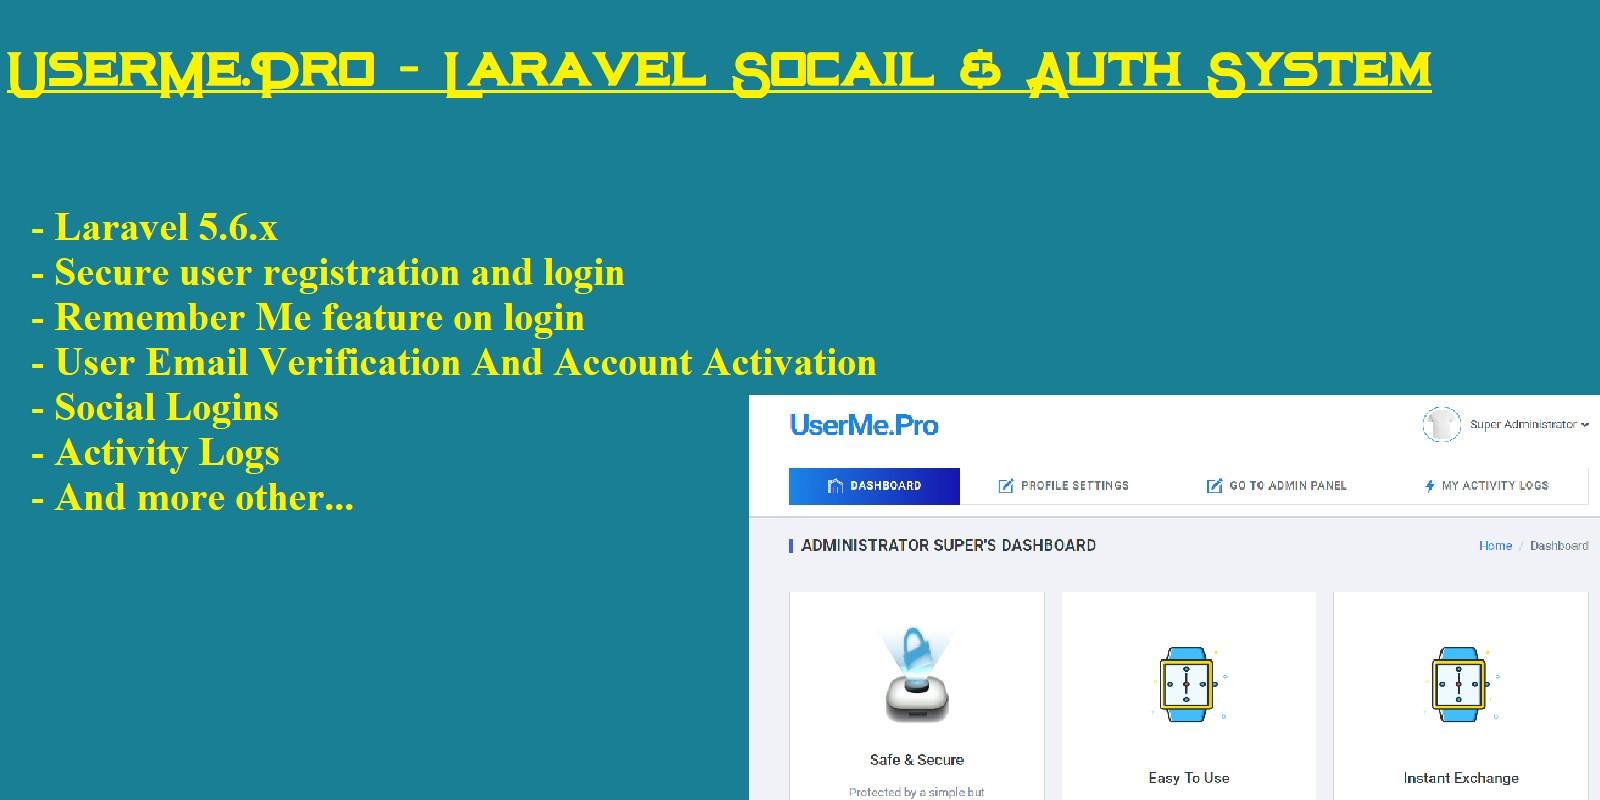 UserMe Pro - Laravel Social Auth System